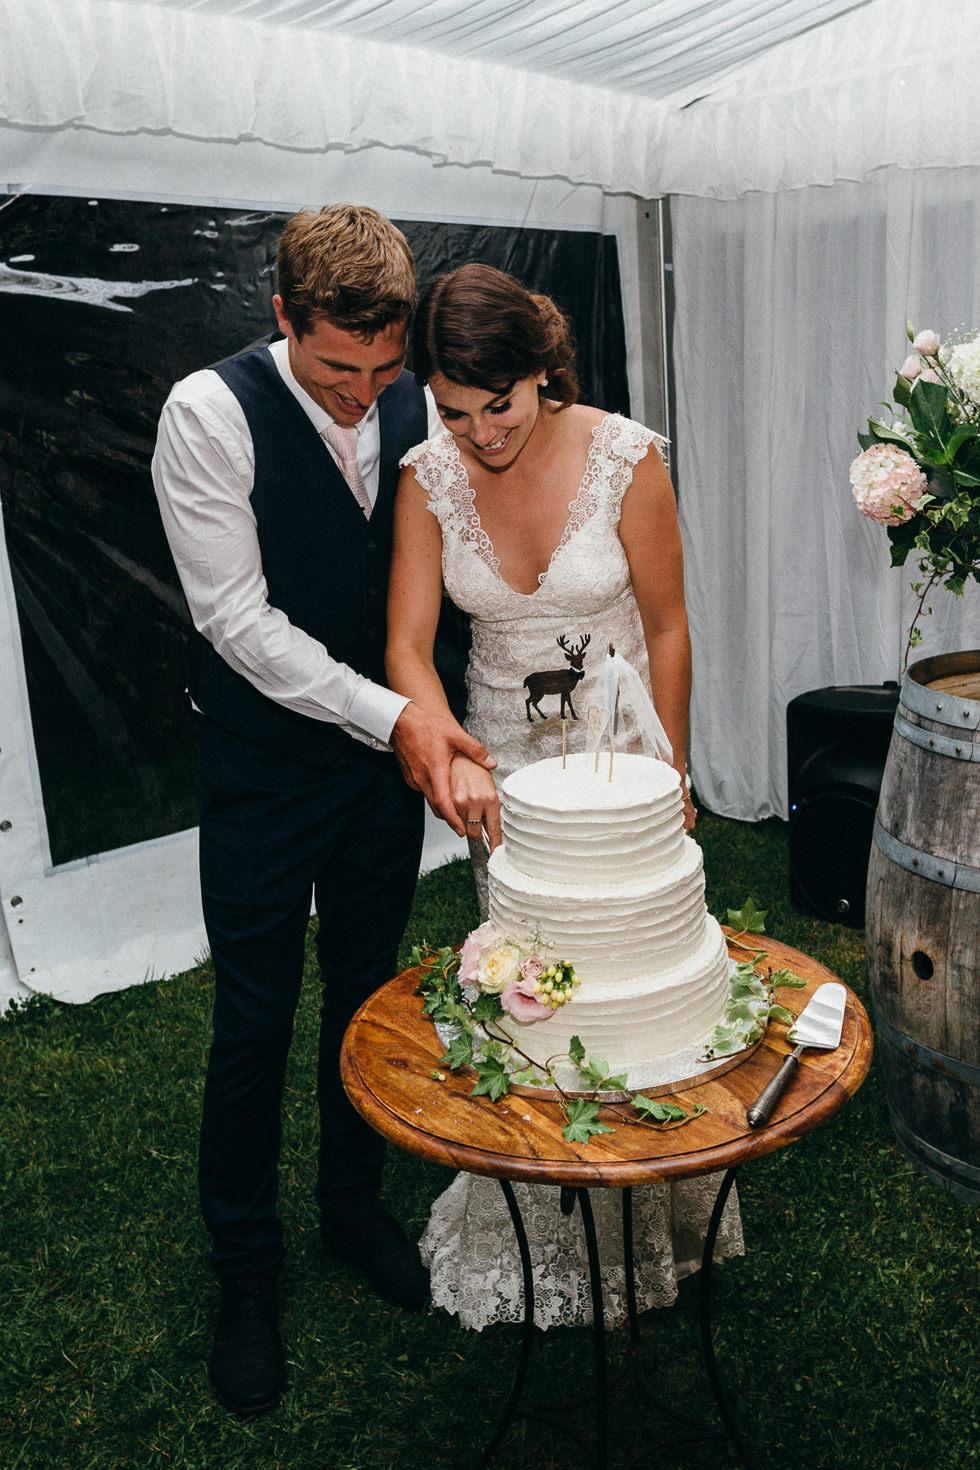 coromandel_cooks_beach_wedding_photos_1197a.jpg